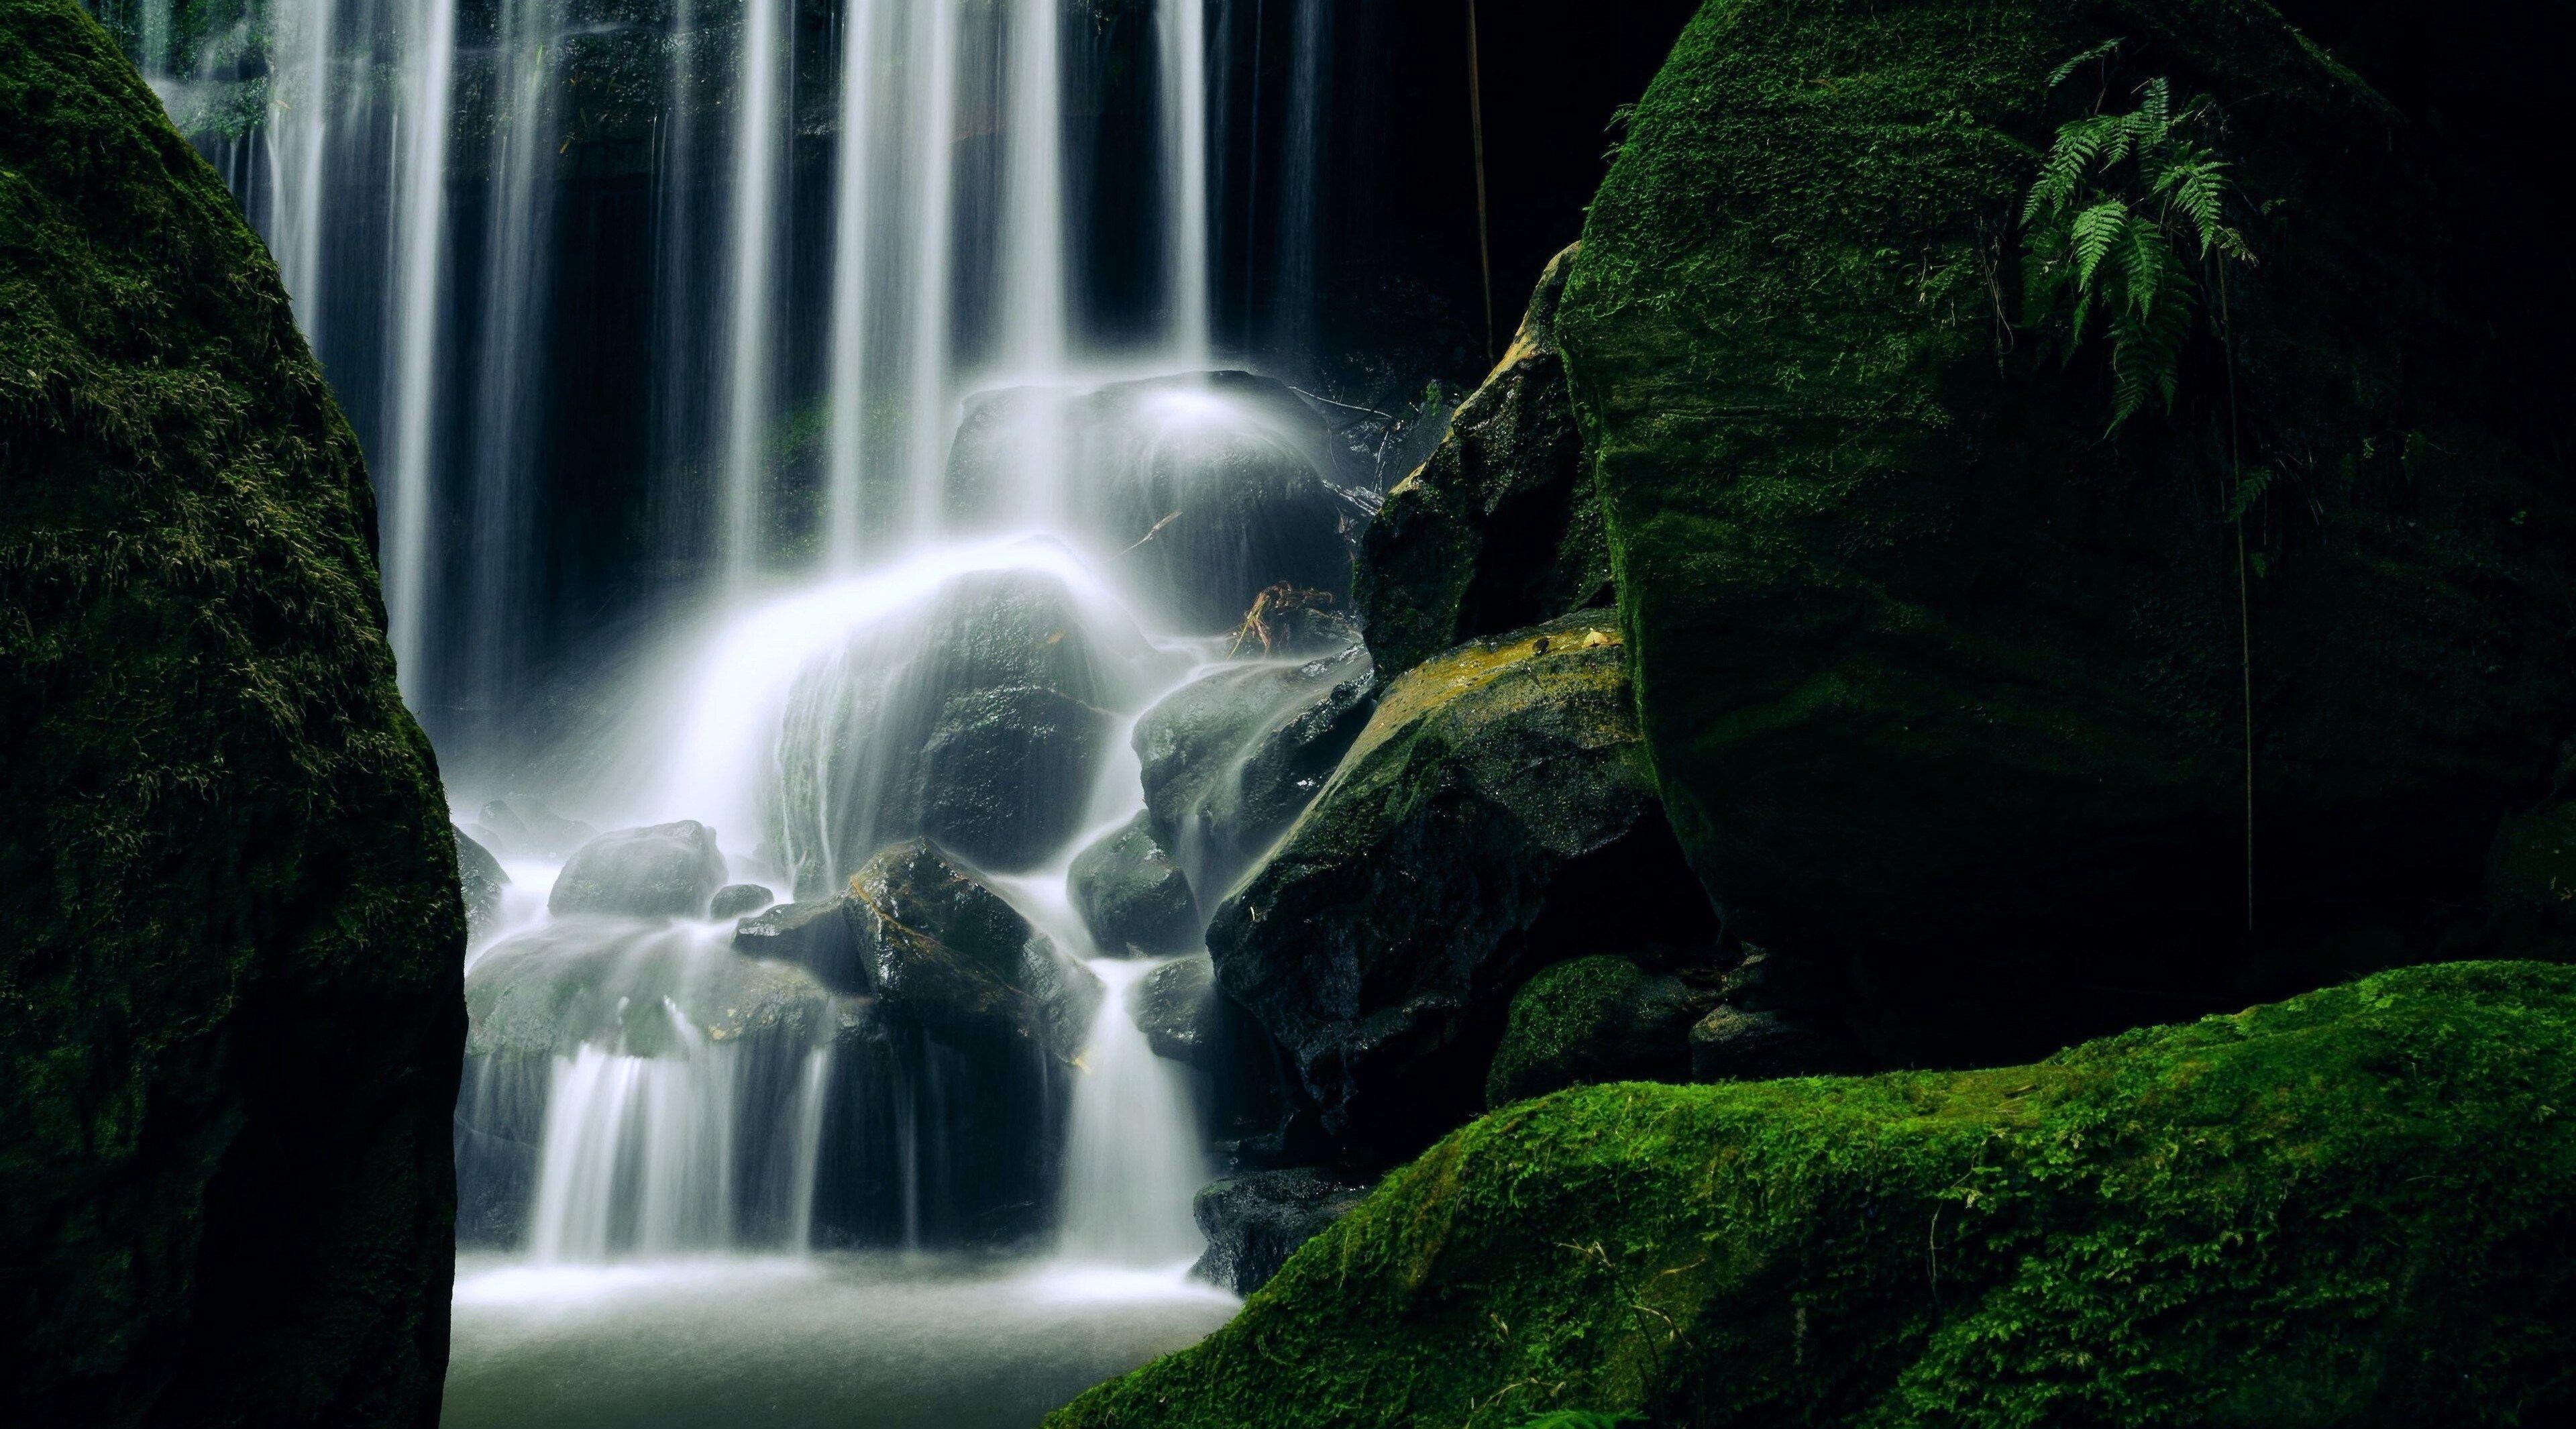 3840x2130 Waterfall 4k Best Computer Wallpaper Waterfall Wallpaper Waterfall Travel And Tourism